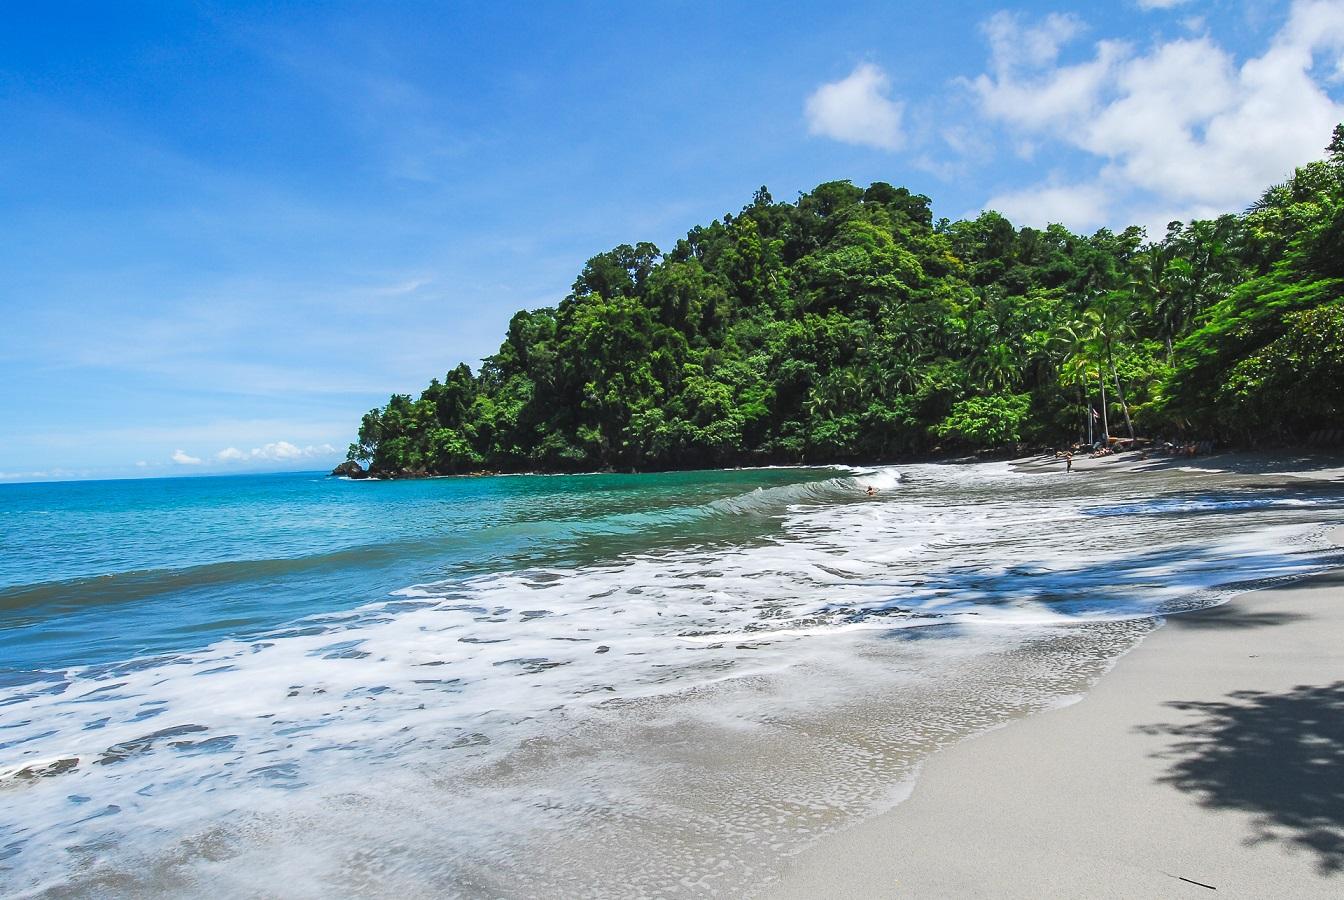 TripAdvisor Rates Costa Rica Resort 2 Hotel in the World